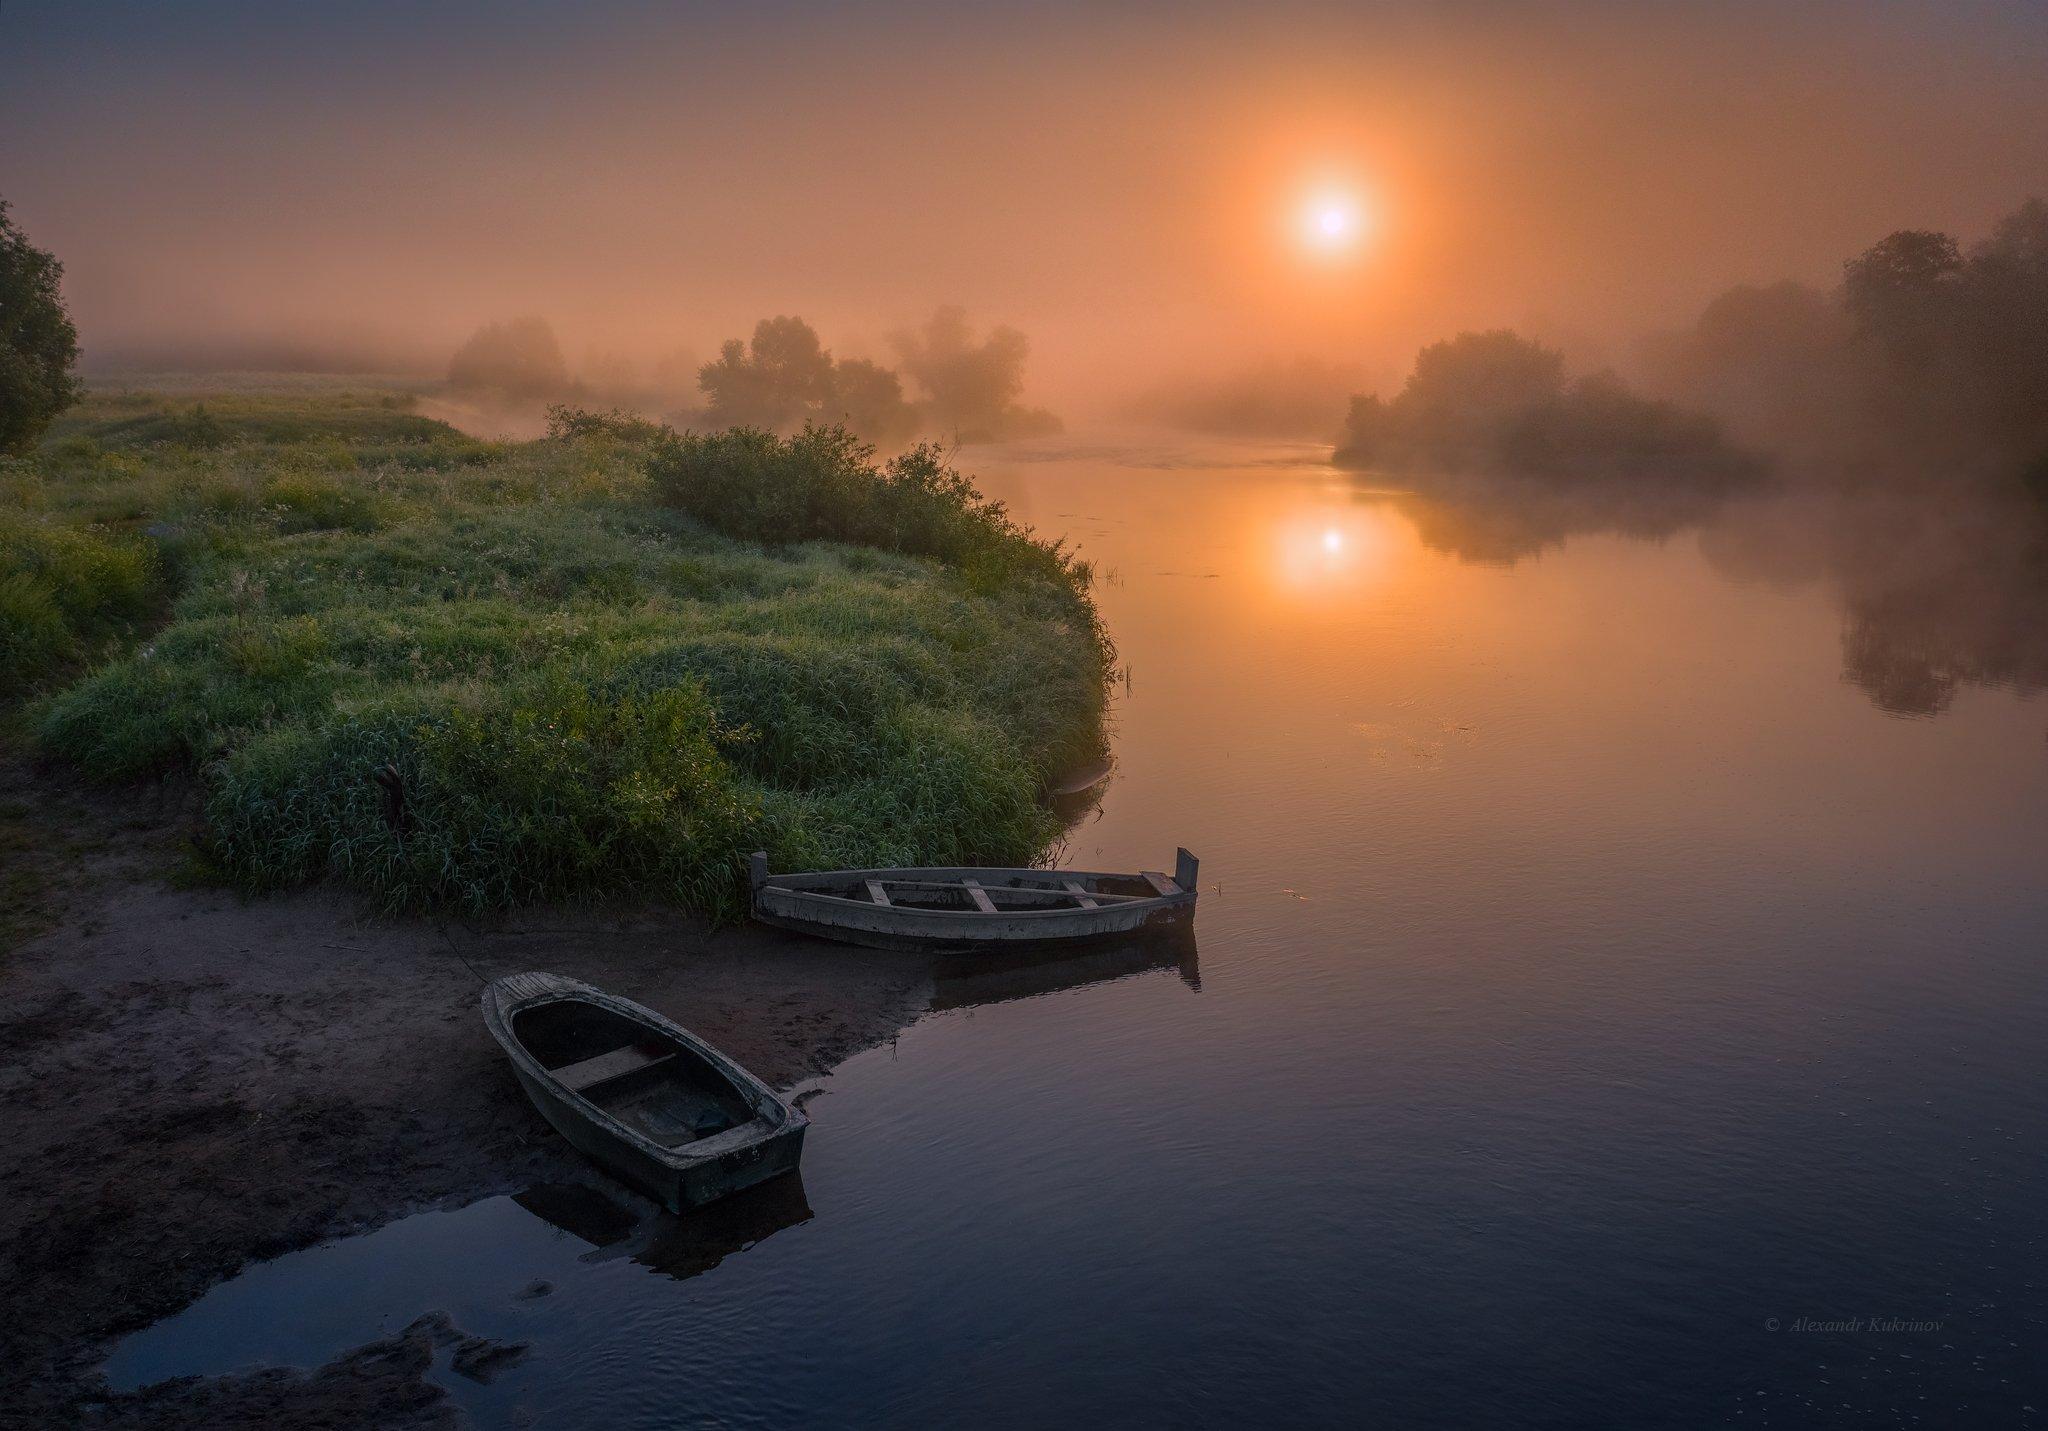 угра,рассвет,утро,пейзаж, Александр Кукринов